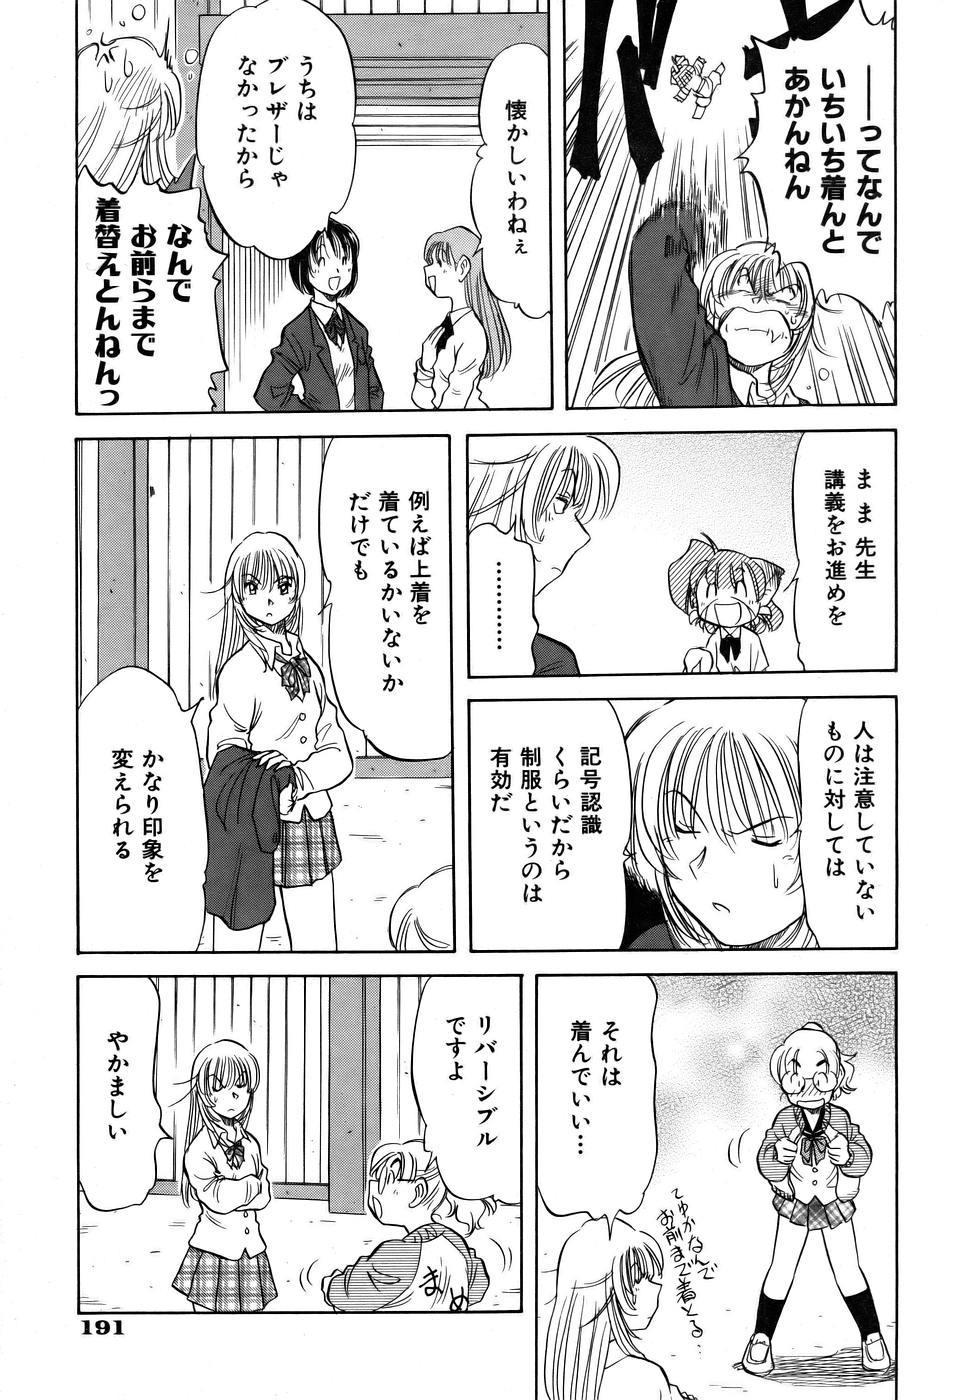 COMIC AUN 2005-12 Vol. 115 190